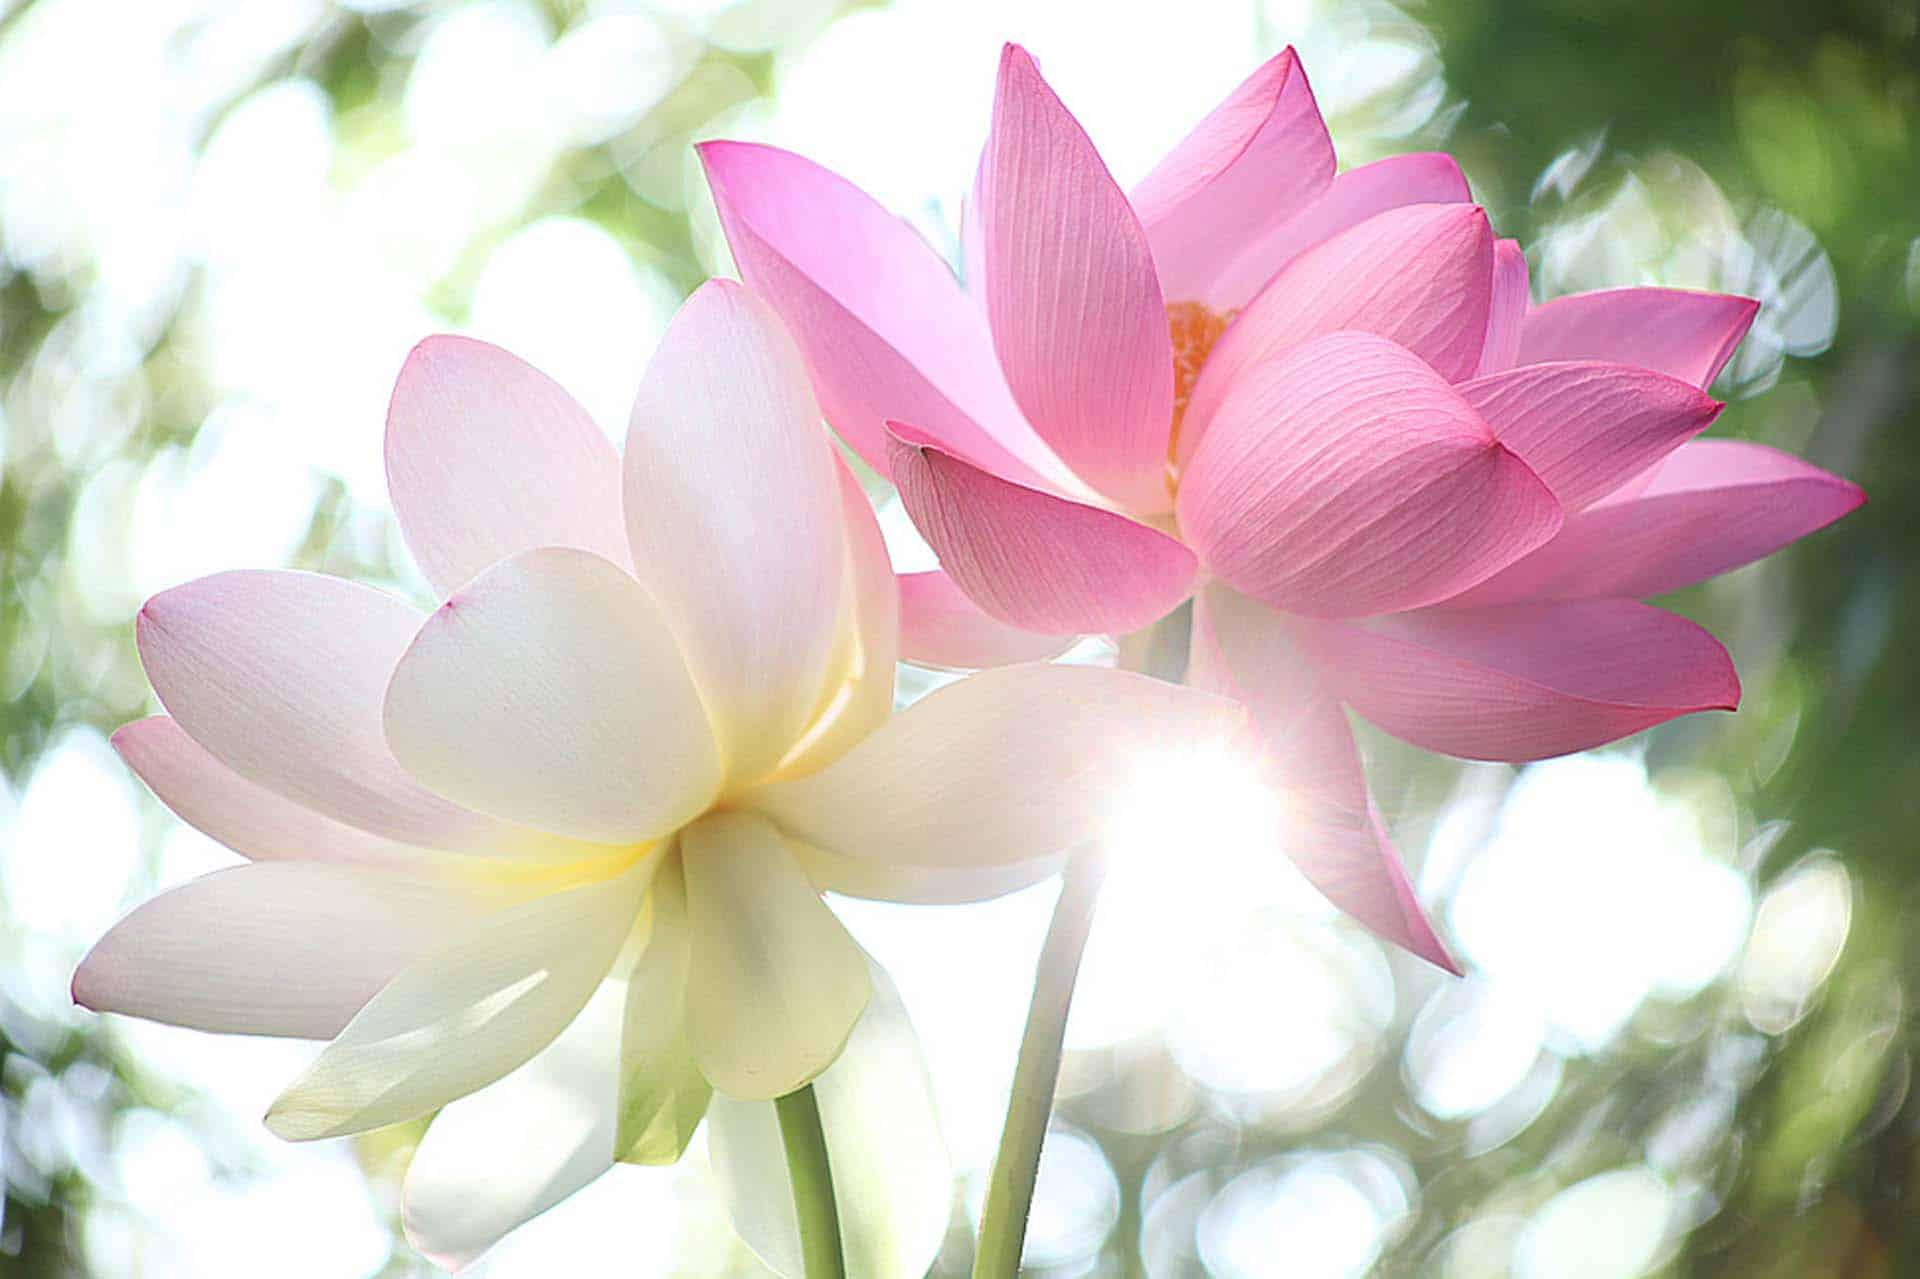 Lotus Flowers at Sun Rise by Bahman Farzad